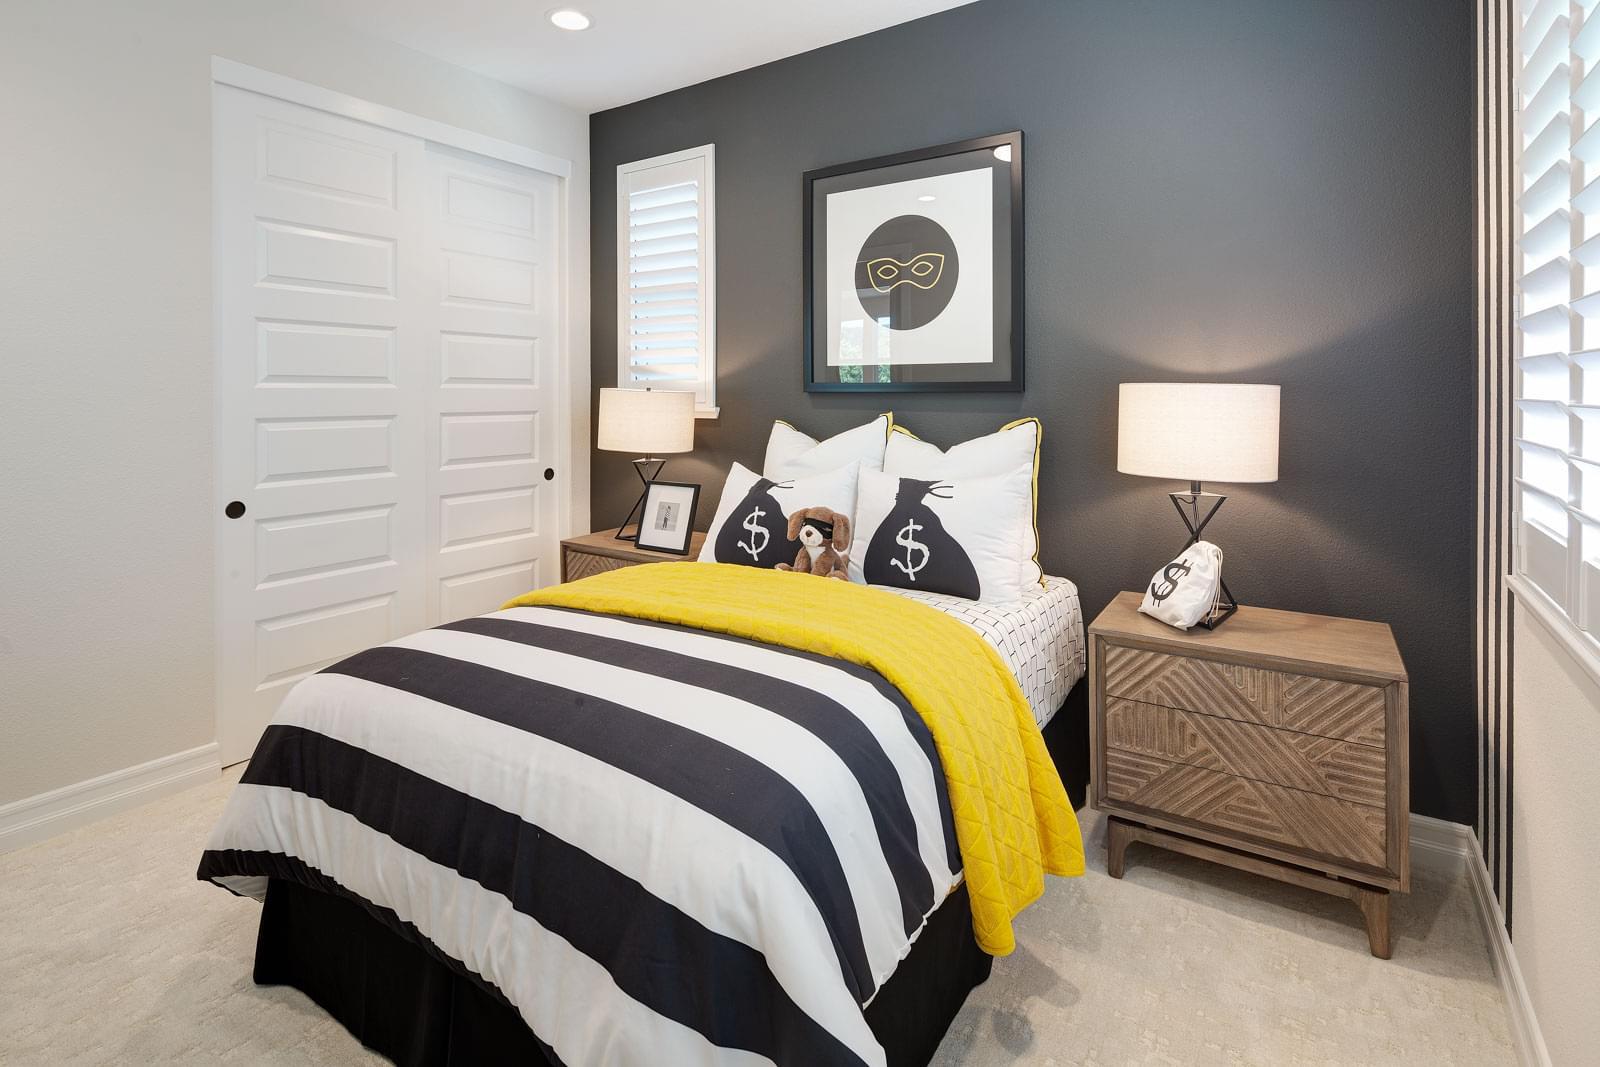 Residence 3 Bedroom 2